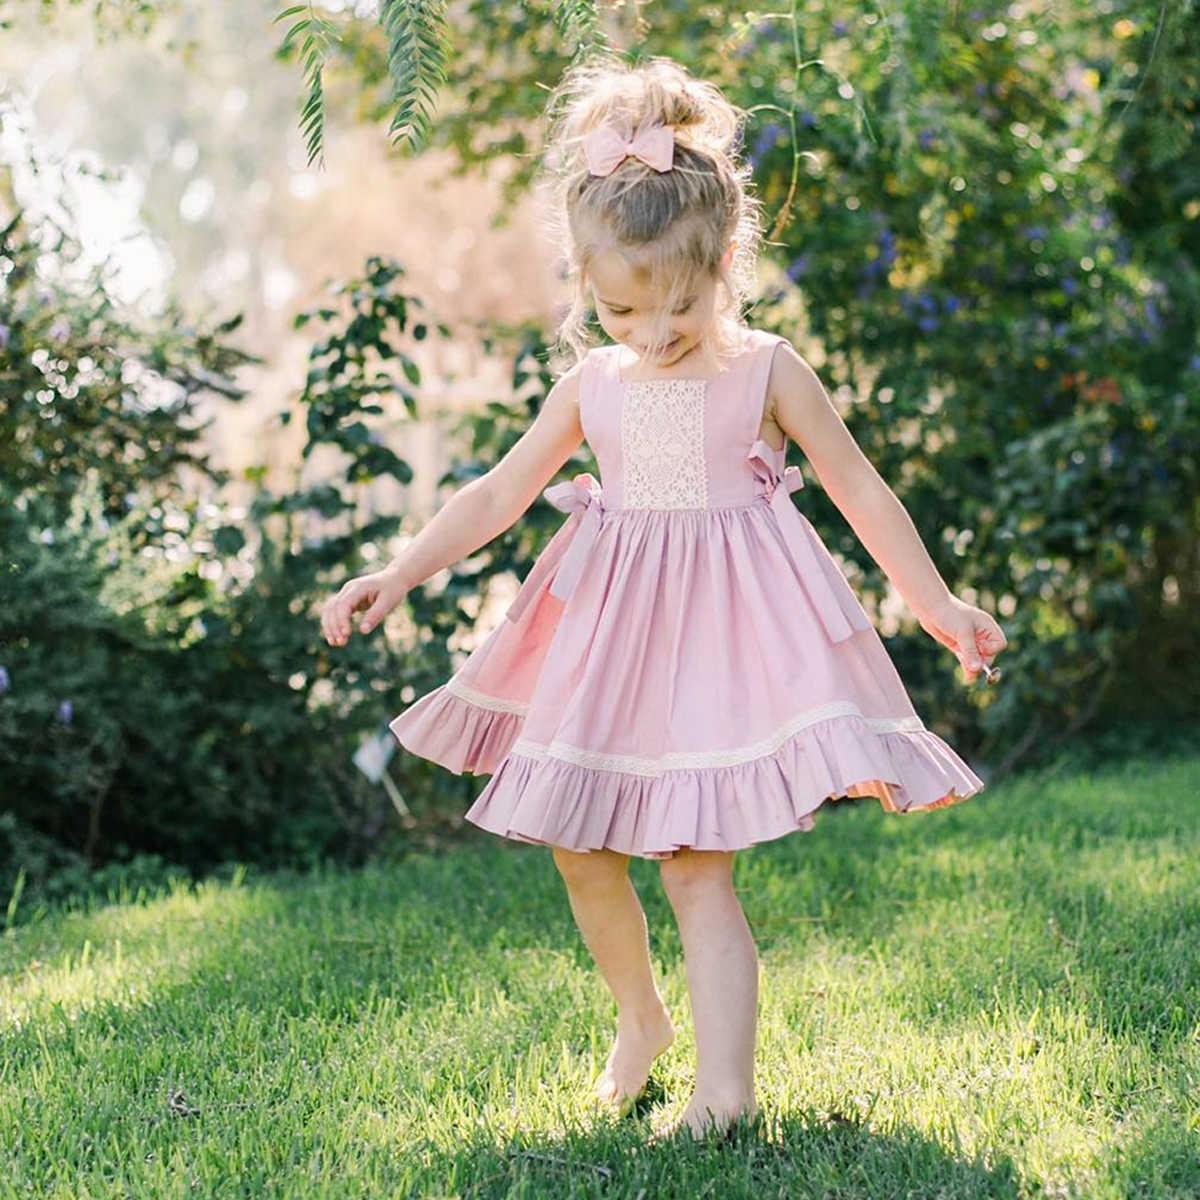 a5df0182da Lace Flower Princess Kid Baby Dress For Girls Sleeveless Bow Tutu Party  Wedding Pageant Dress Sundress